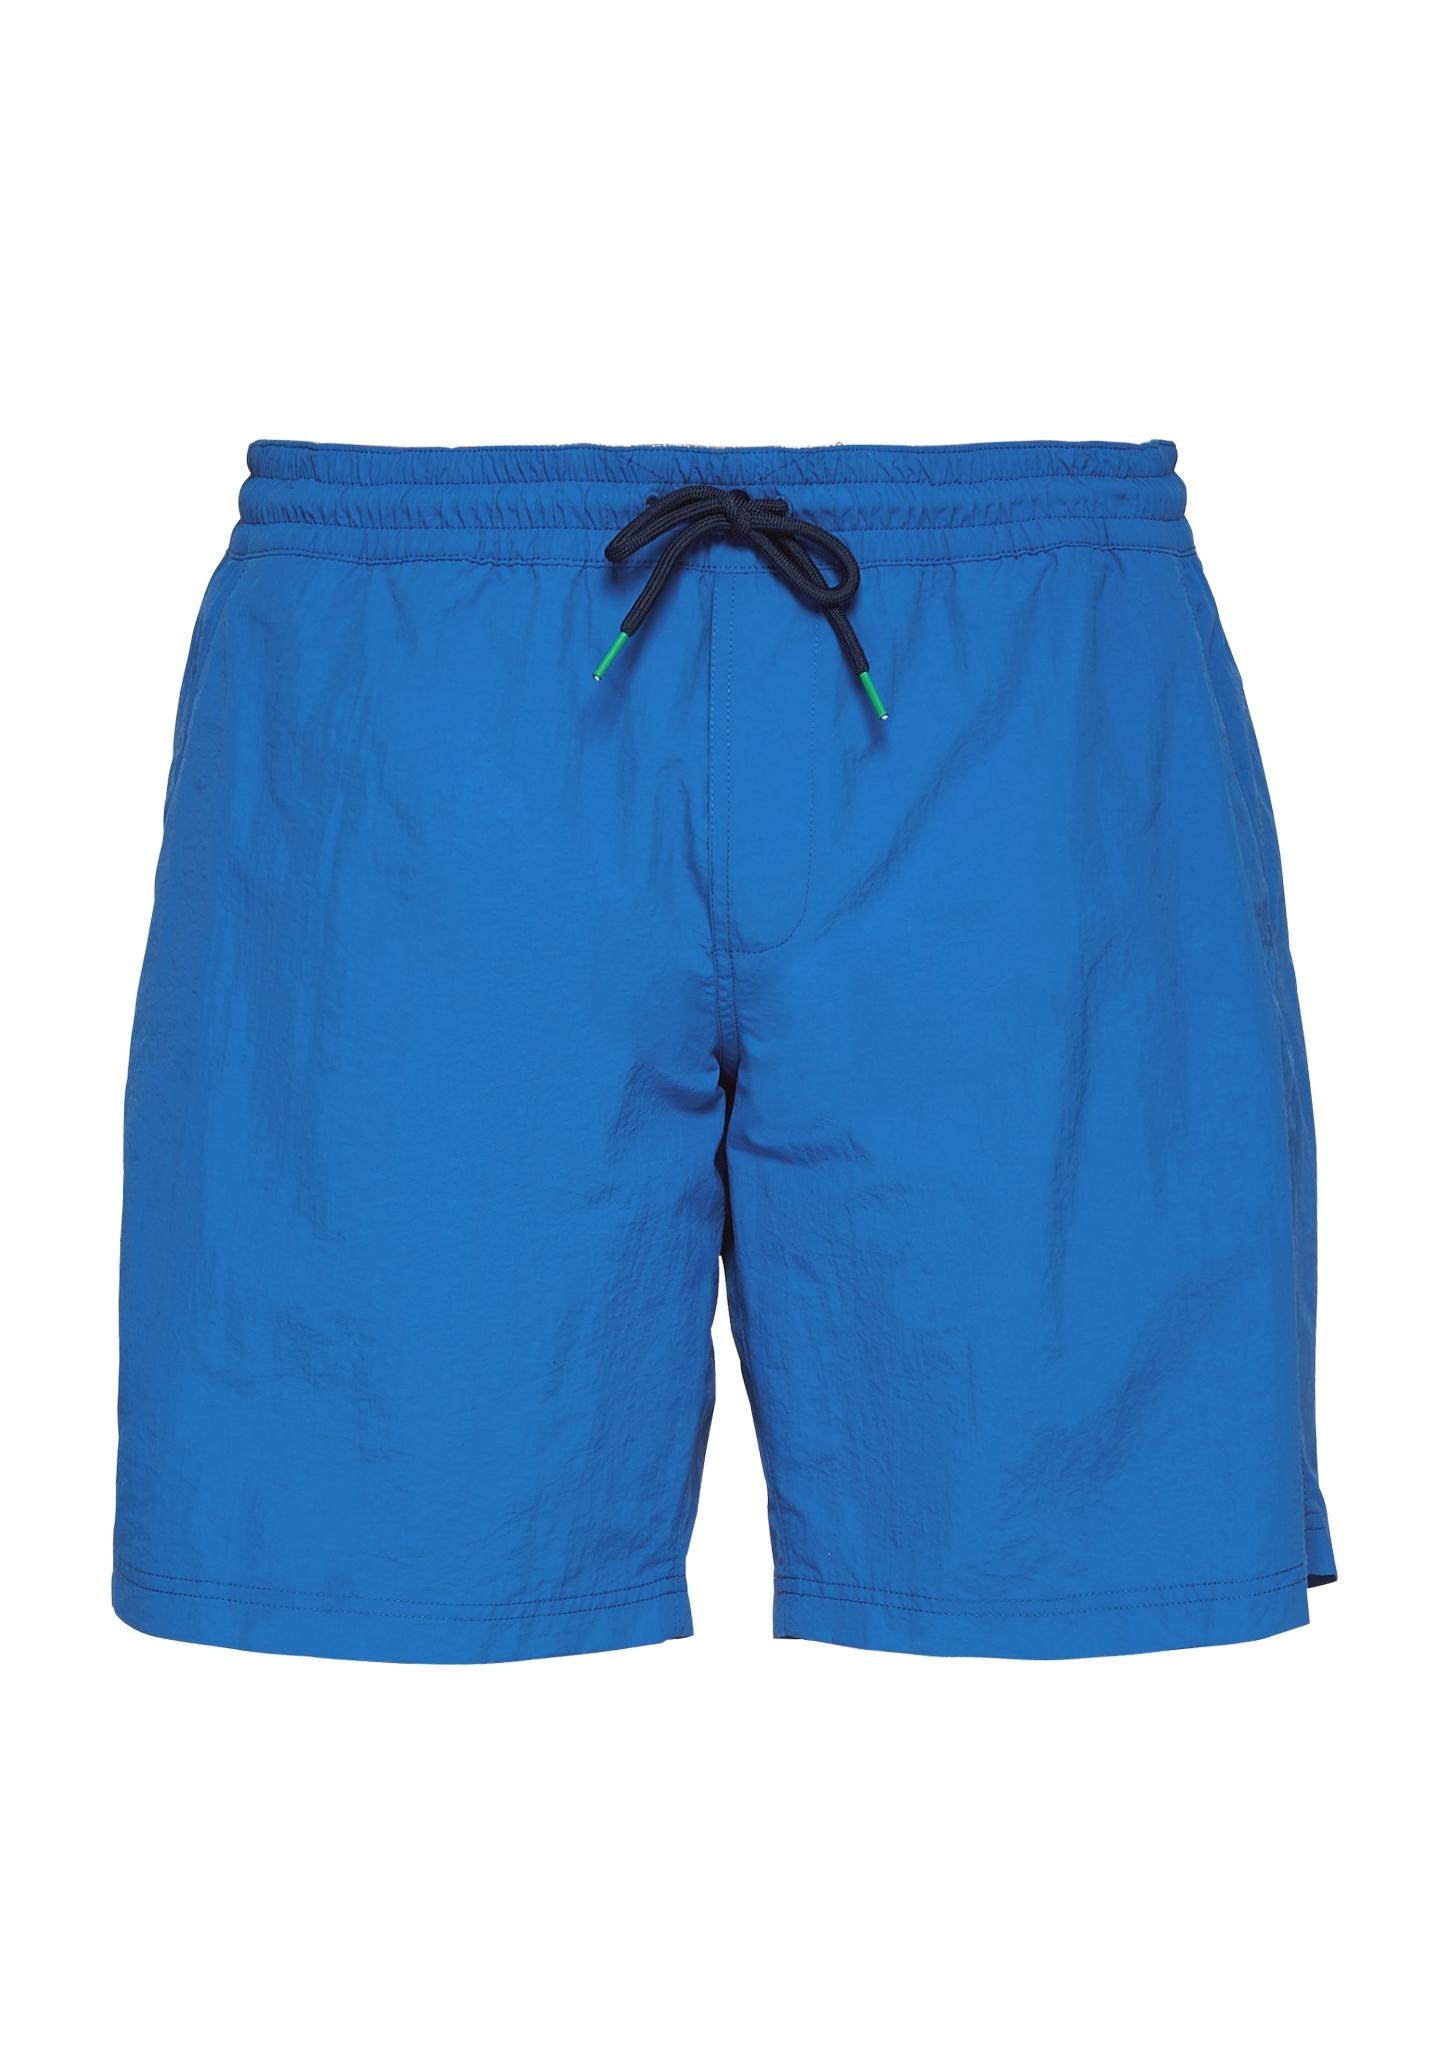 Badeshorts | Bekleidung > Bademode > Badeshorts | Blau | Obermaterial 100% polyamid| futter 100% polyester | s.Oliver Men Big Sizes